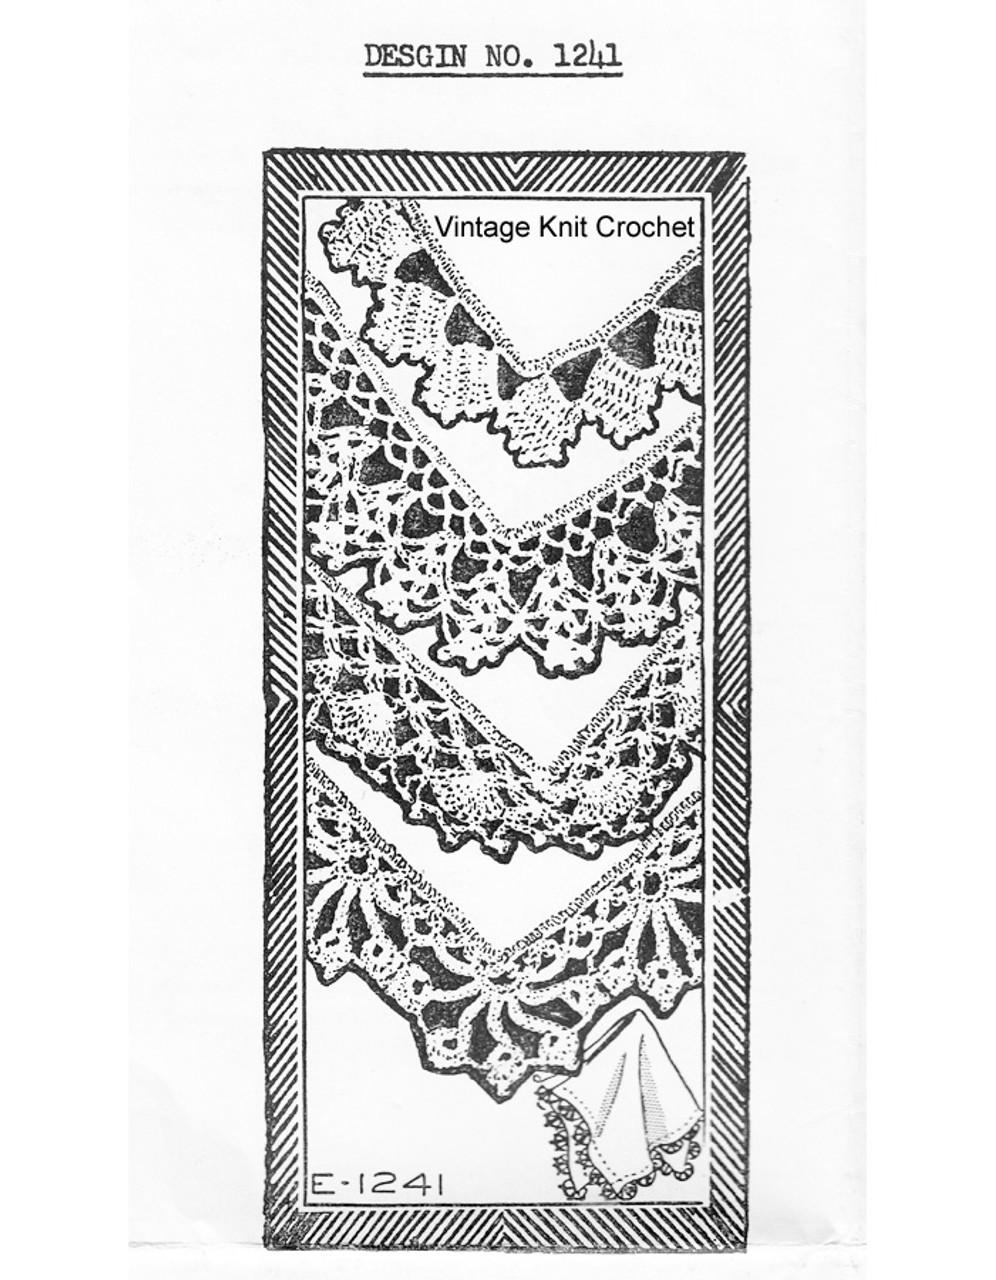 Vintage Crochet Edgings Pattern Design 1241